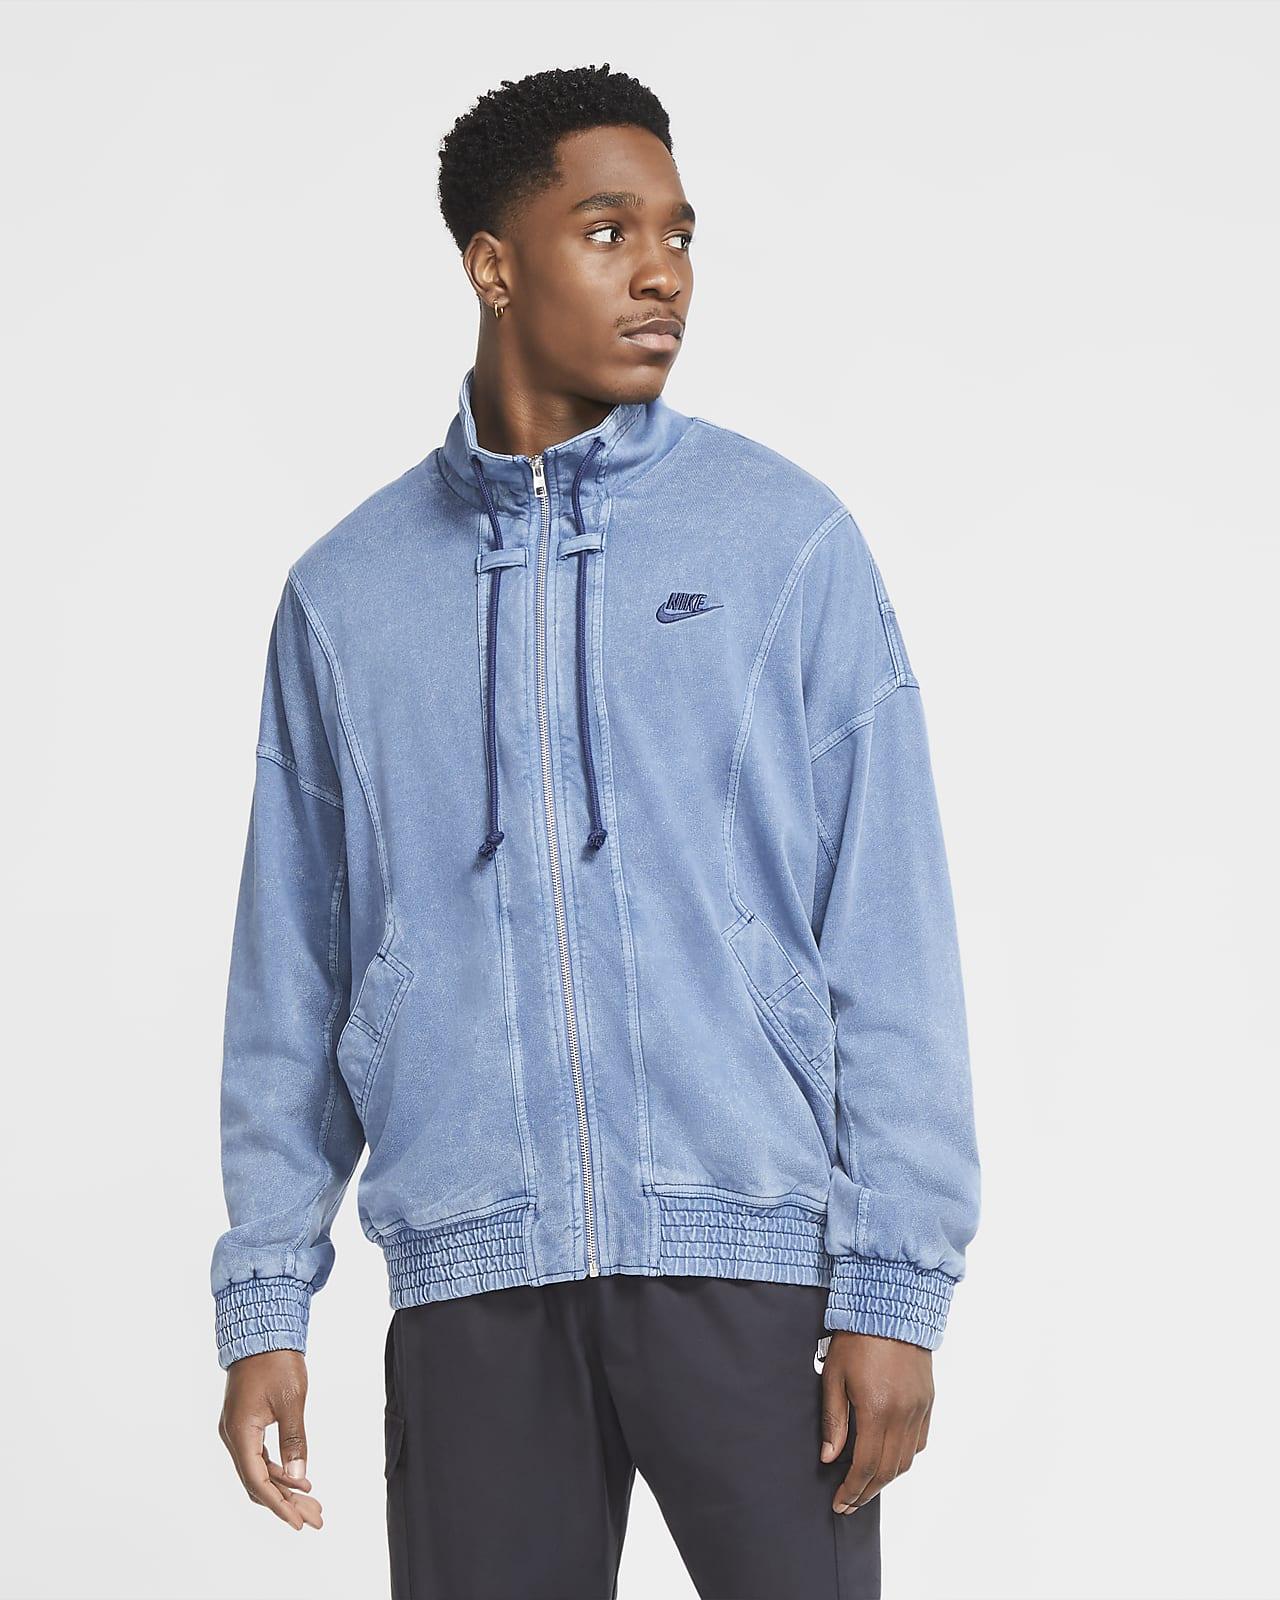 Nike Sportswear Knit herenjack met gewassen look